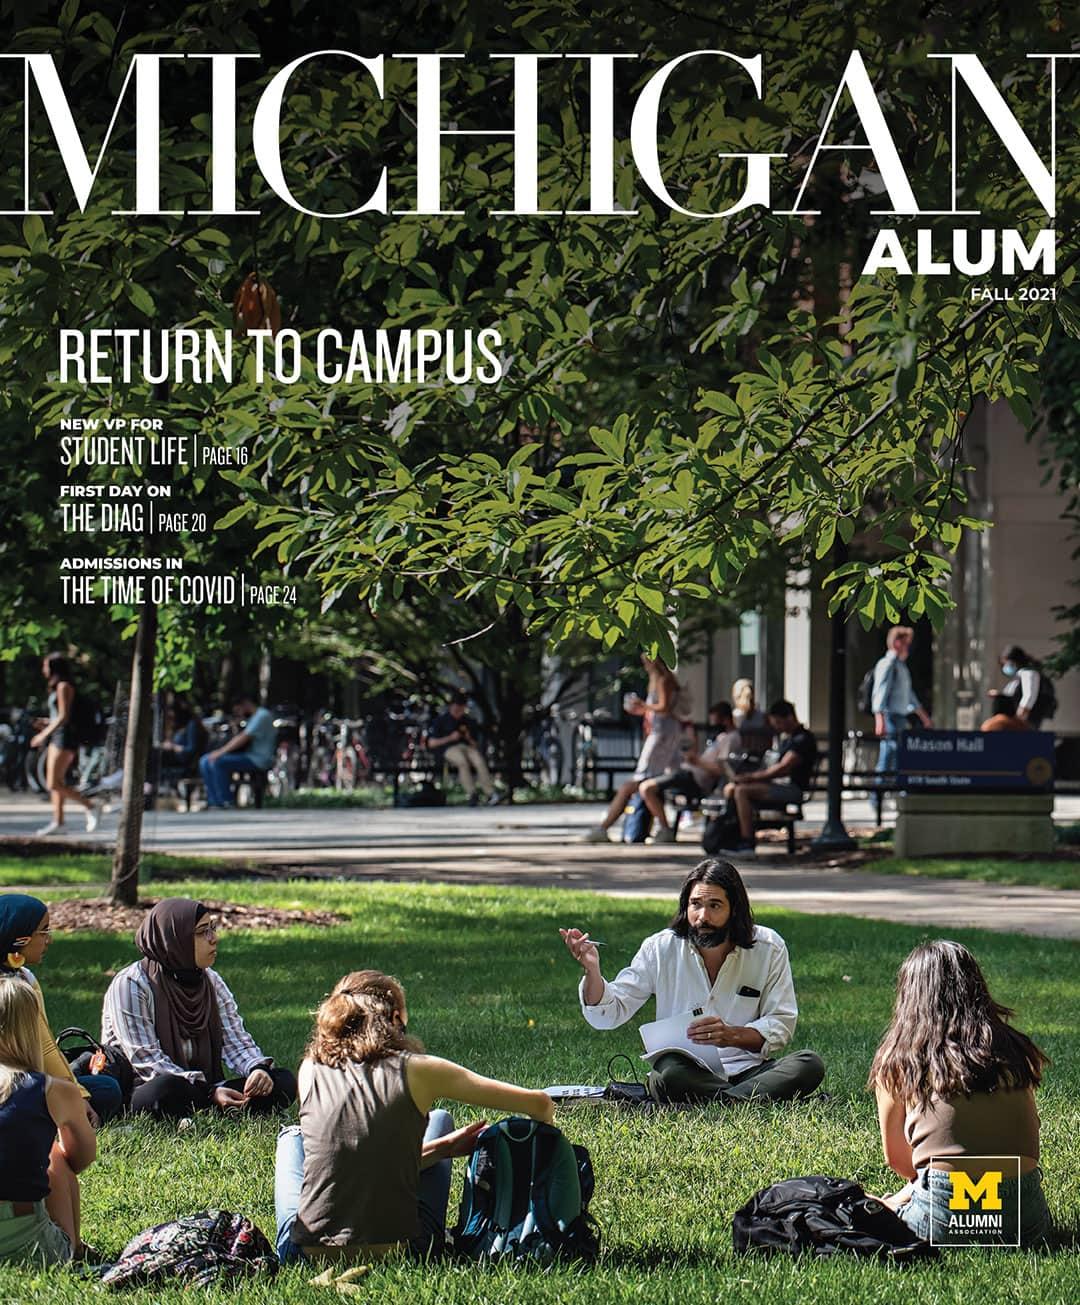 Fall 2021 Michigan Alum Cover